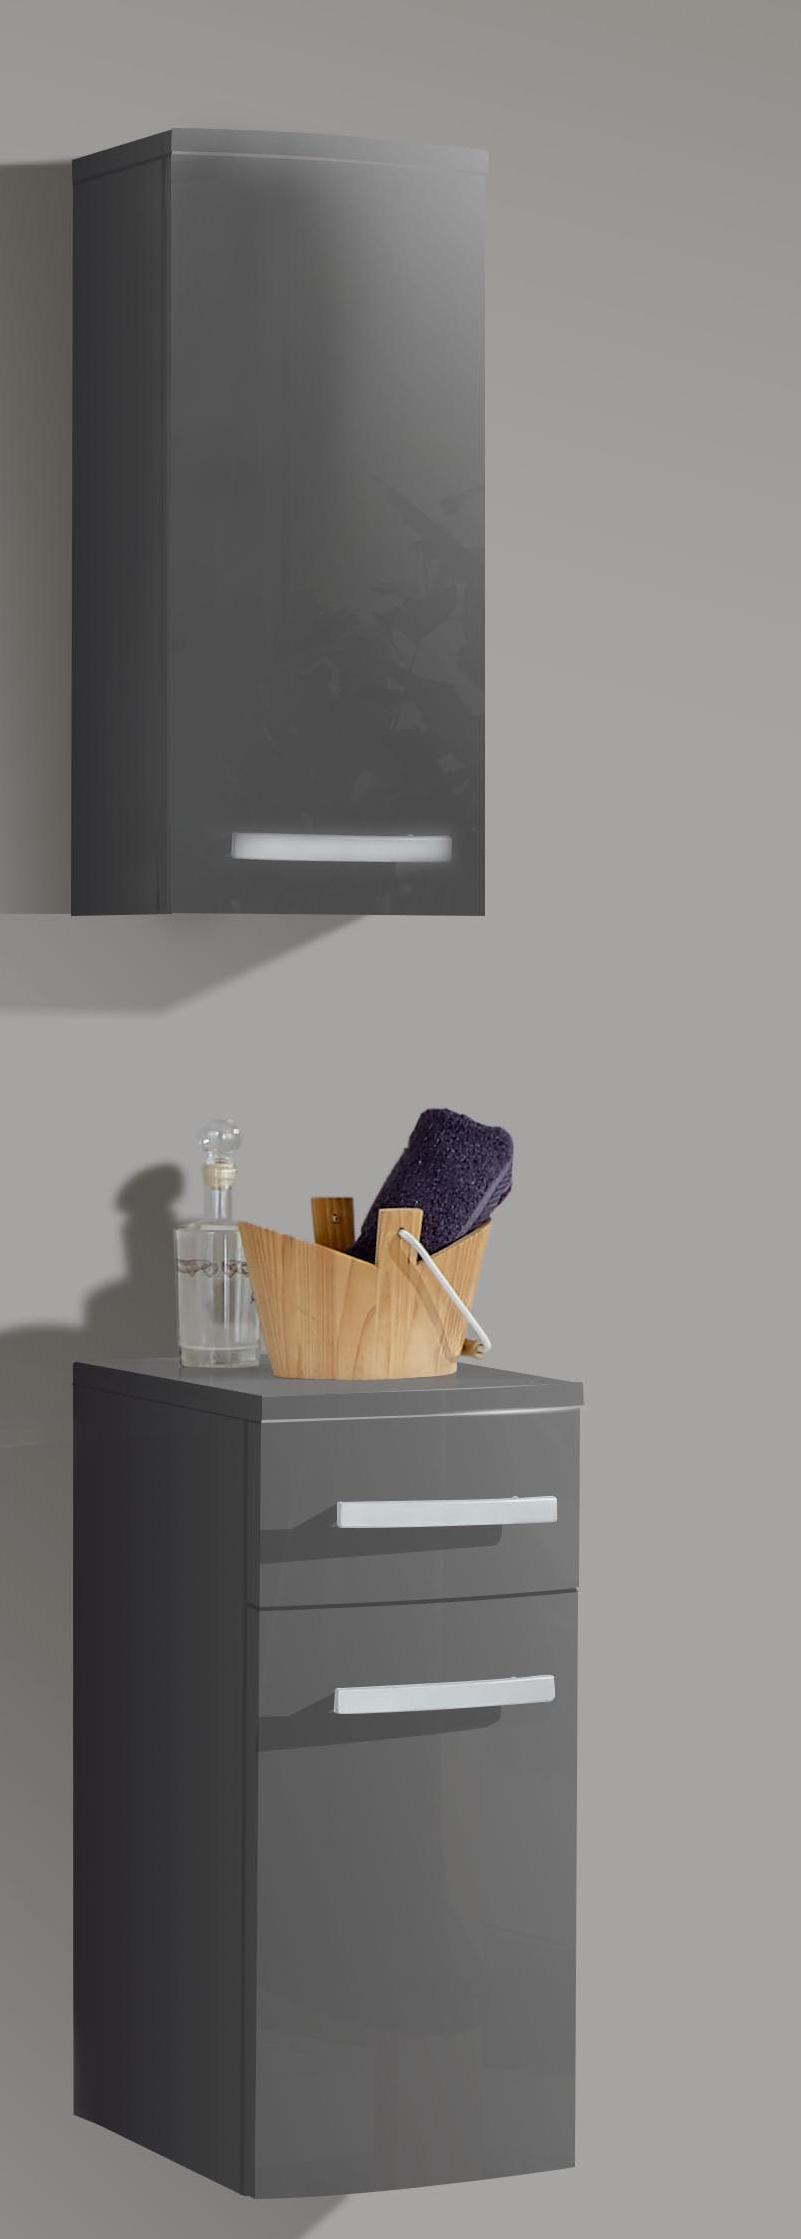 sam 4tlg badezimmer set hochglanz grau 100cm genf deluxe auf lager. Black Bedroom Furniture Sets. Home Design Ideas